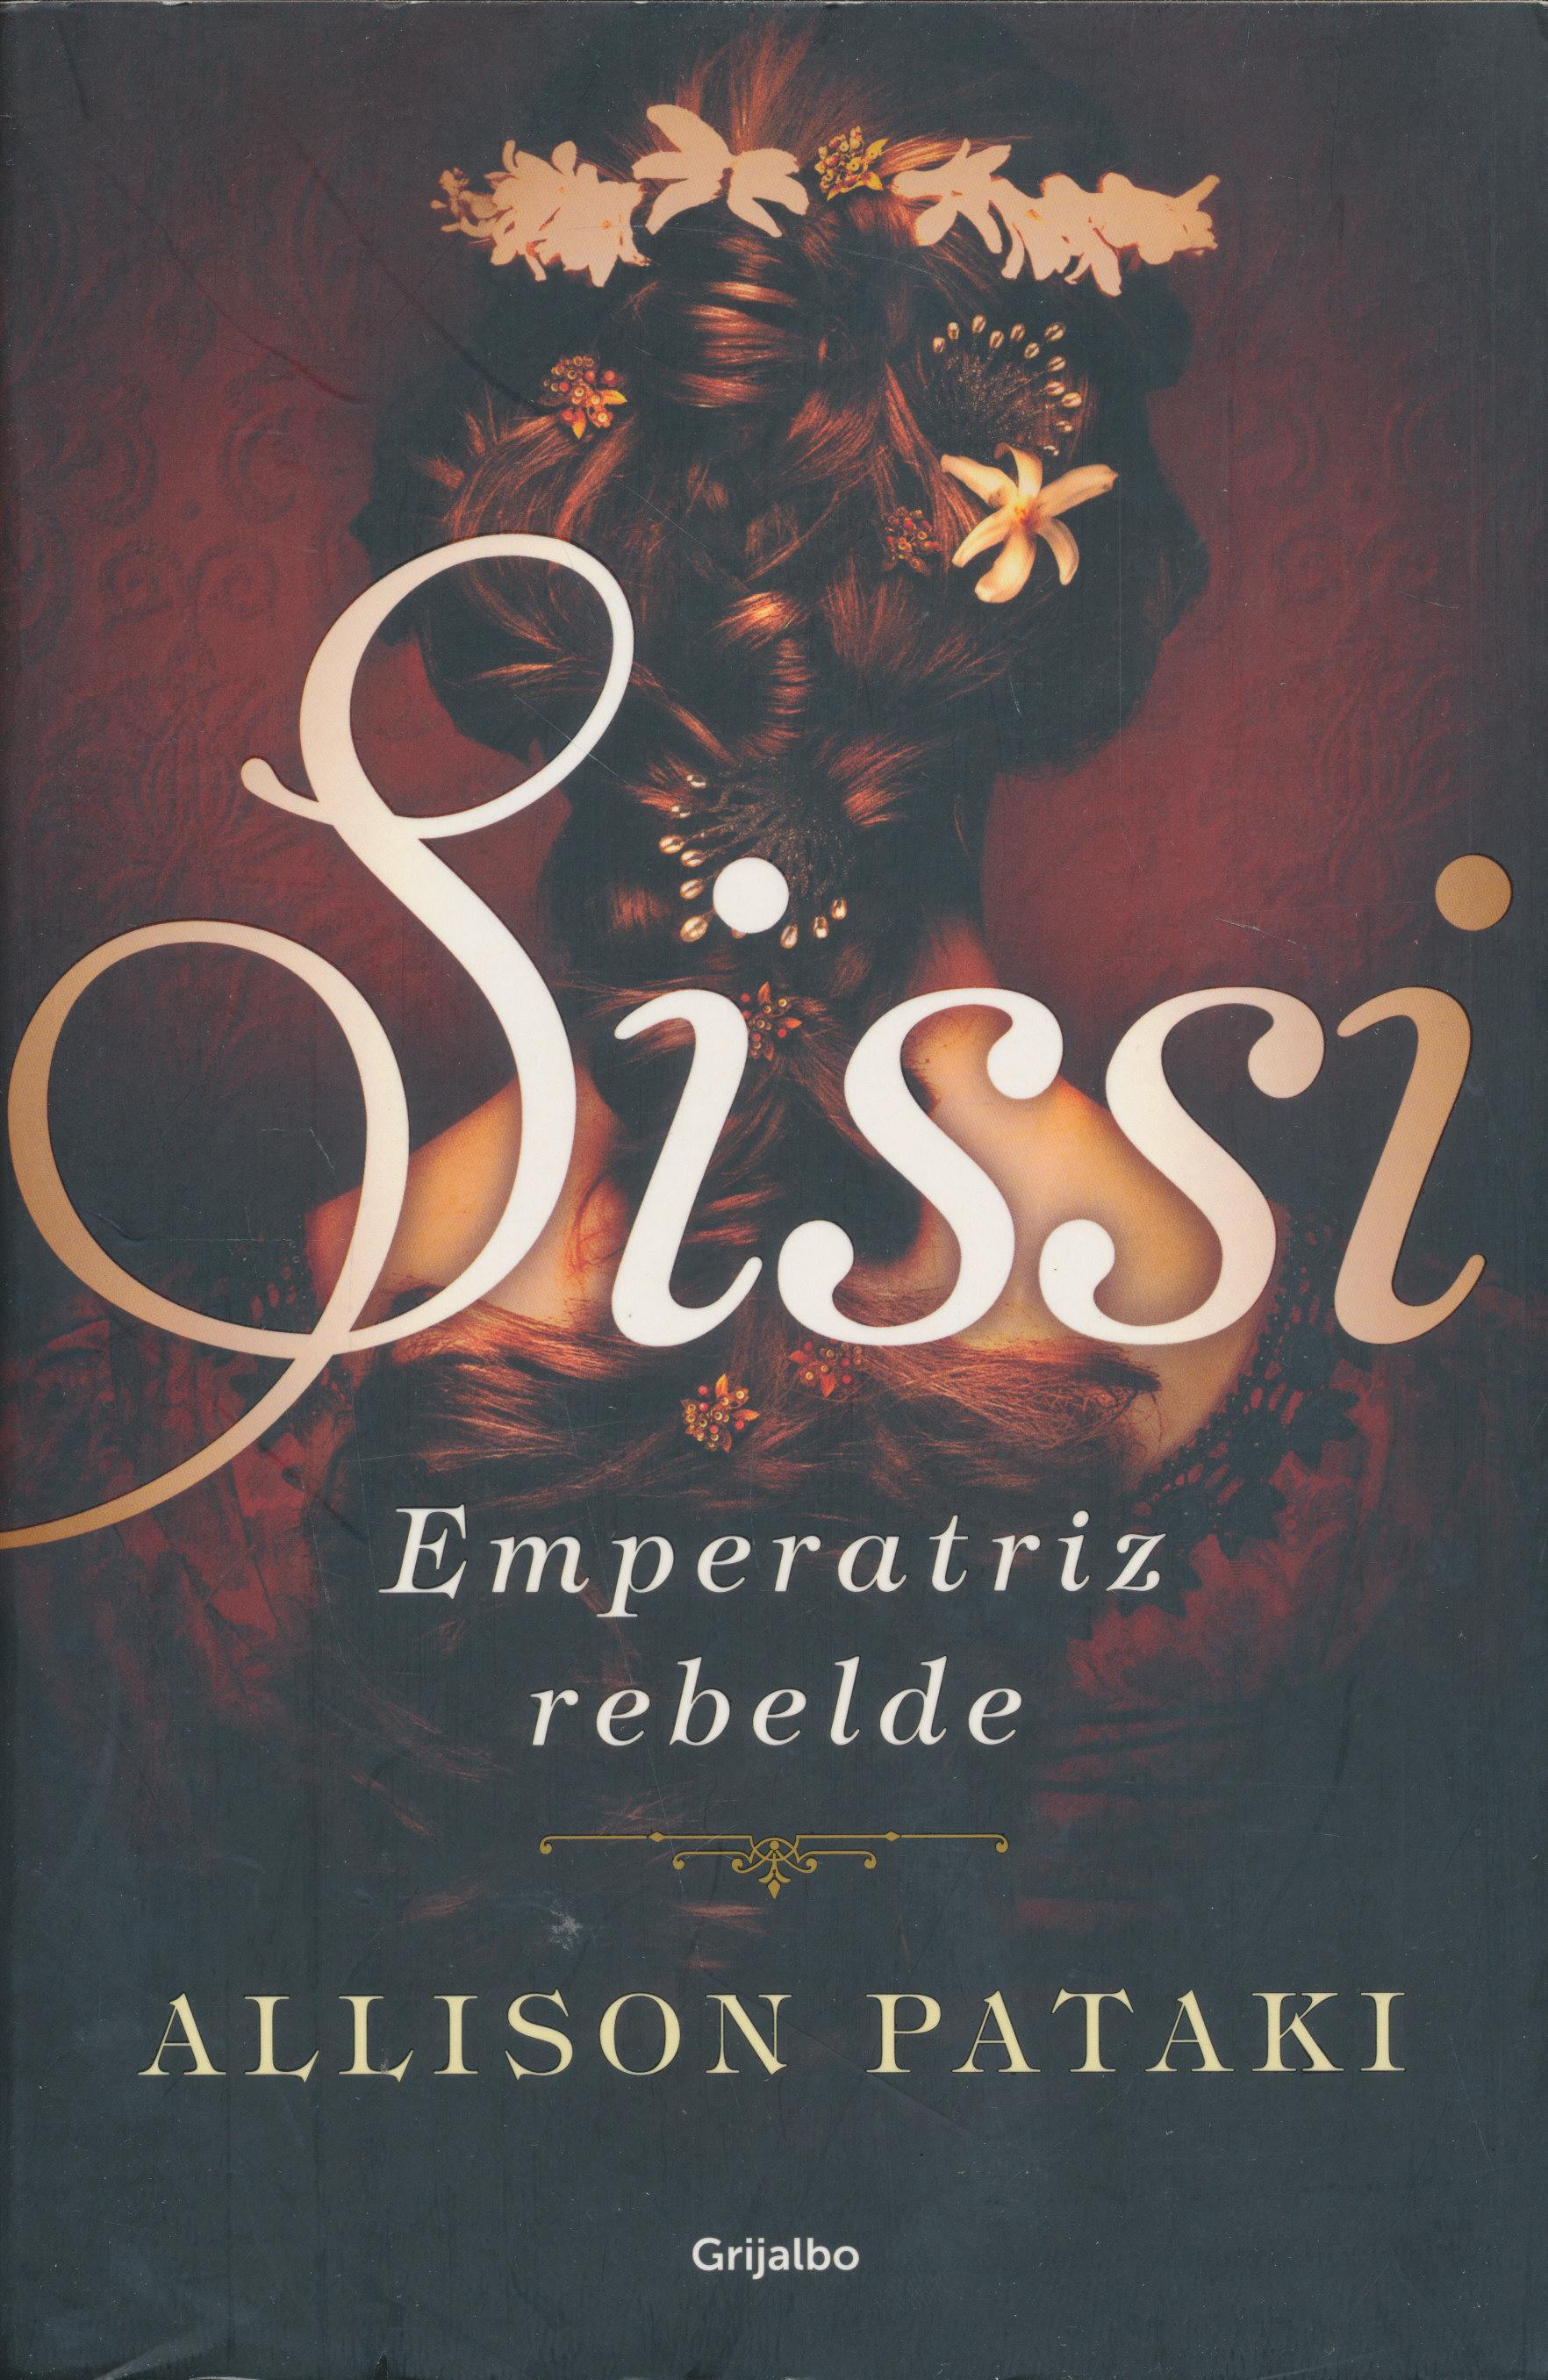 Allison Pataki:Sisi - Emperatriz rebelde